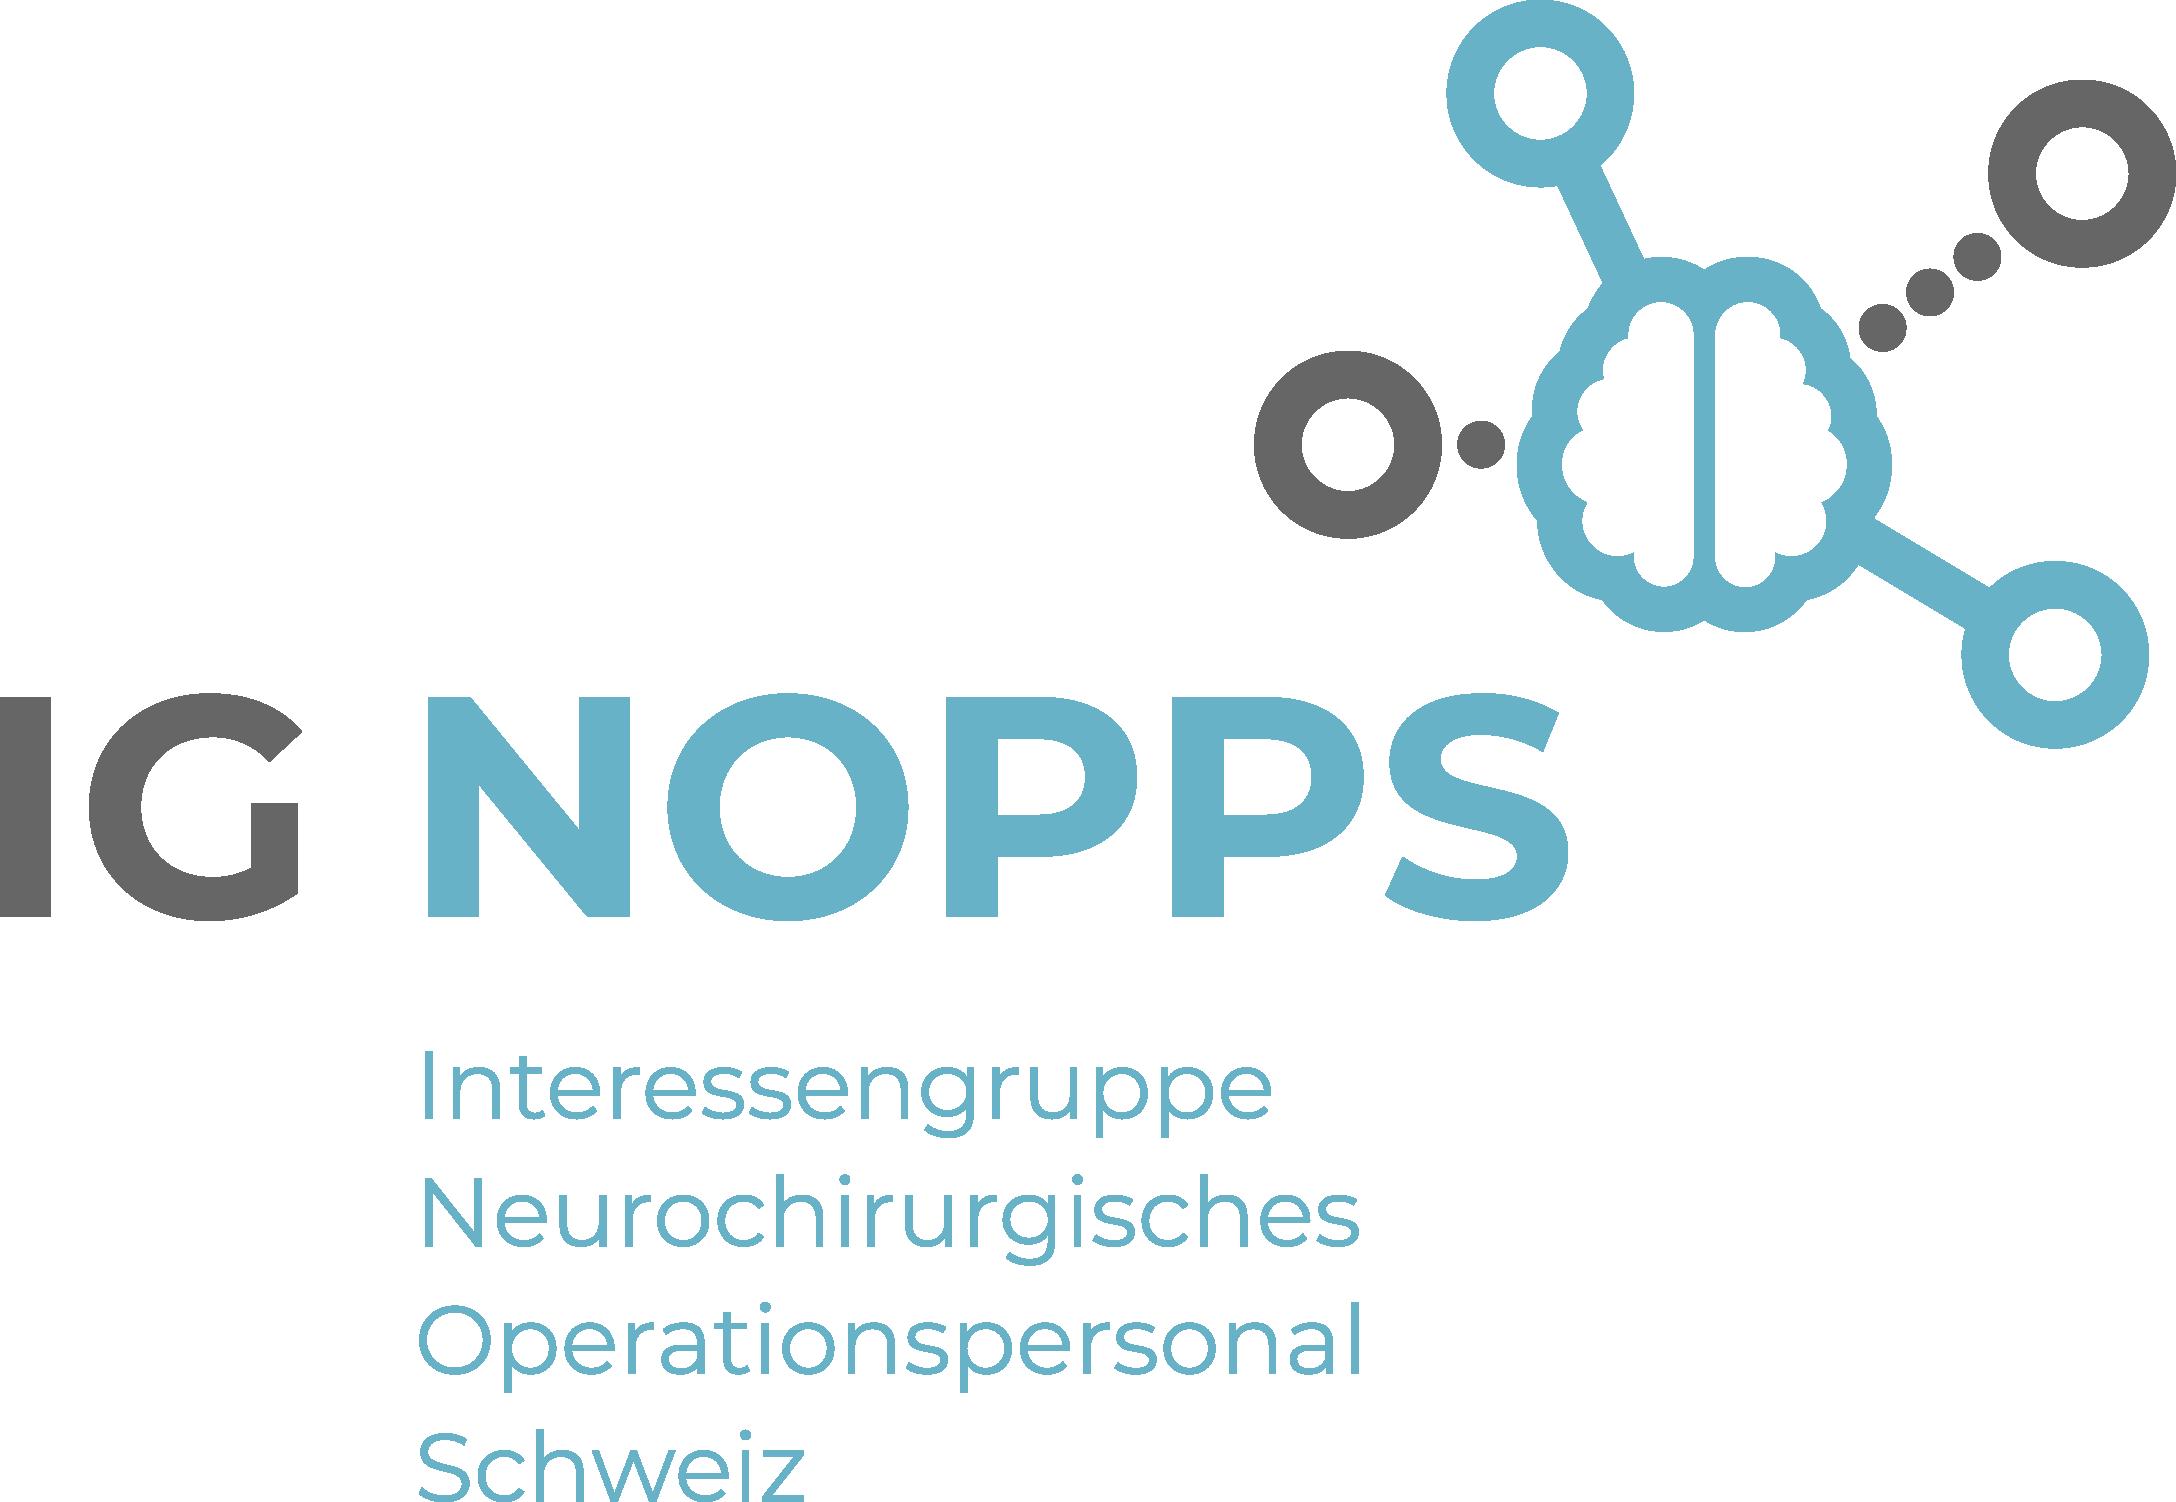 Logo - IG-NOPPS Interessengruppe Neurochirurgisches Operationspersonal Schweiz